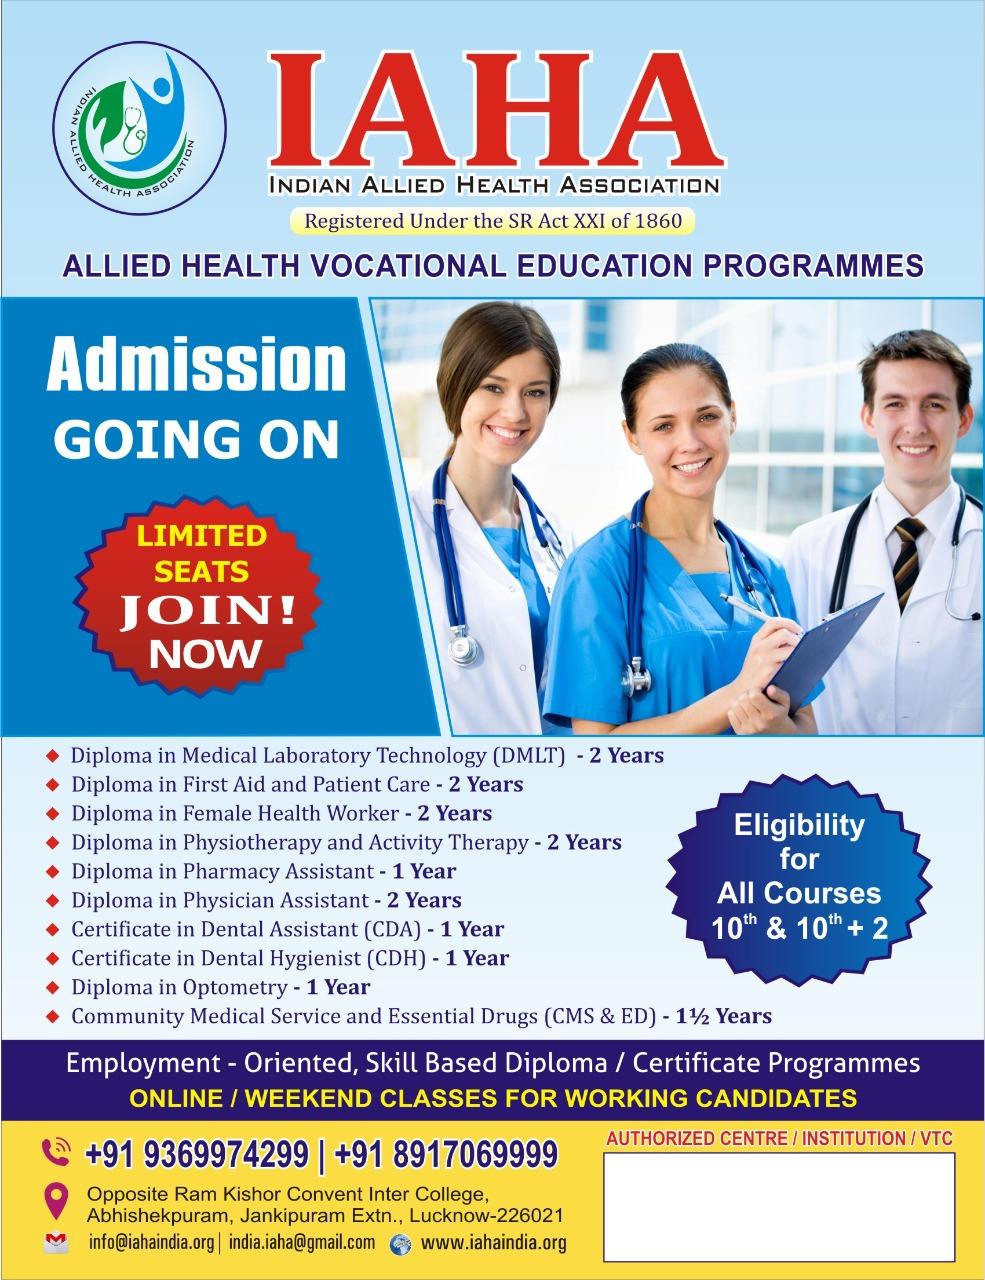 Image for Uttar Pradesh CMS ED Allopathy Diploma Admission CMS ED Course 2020